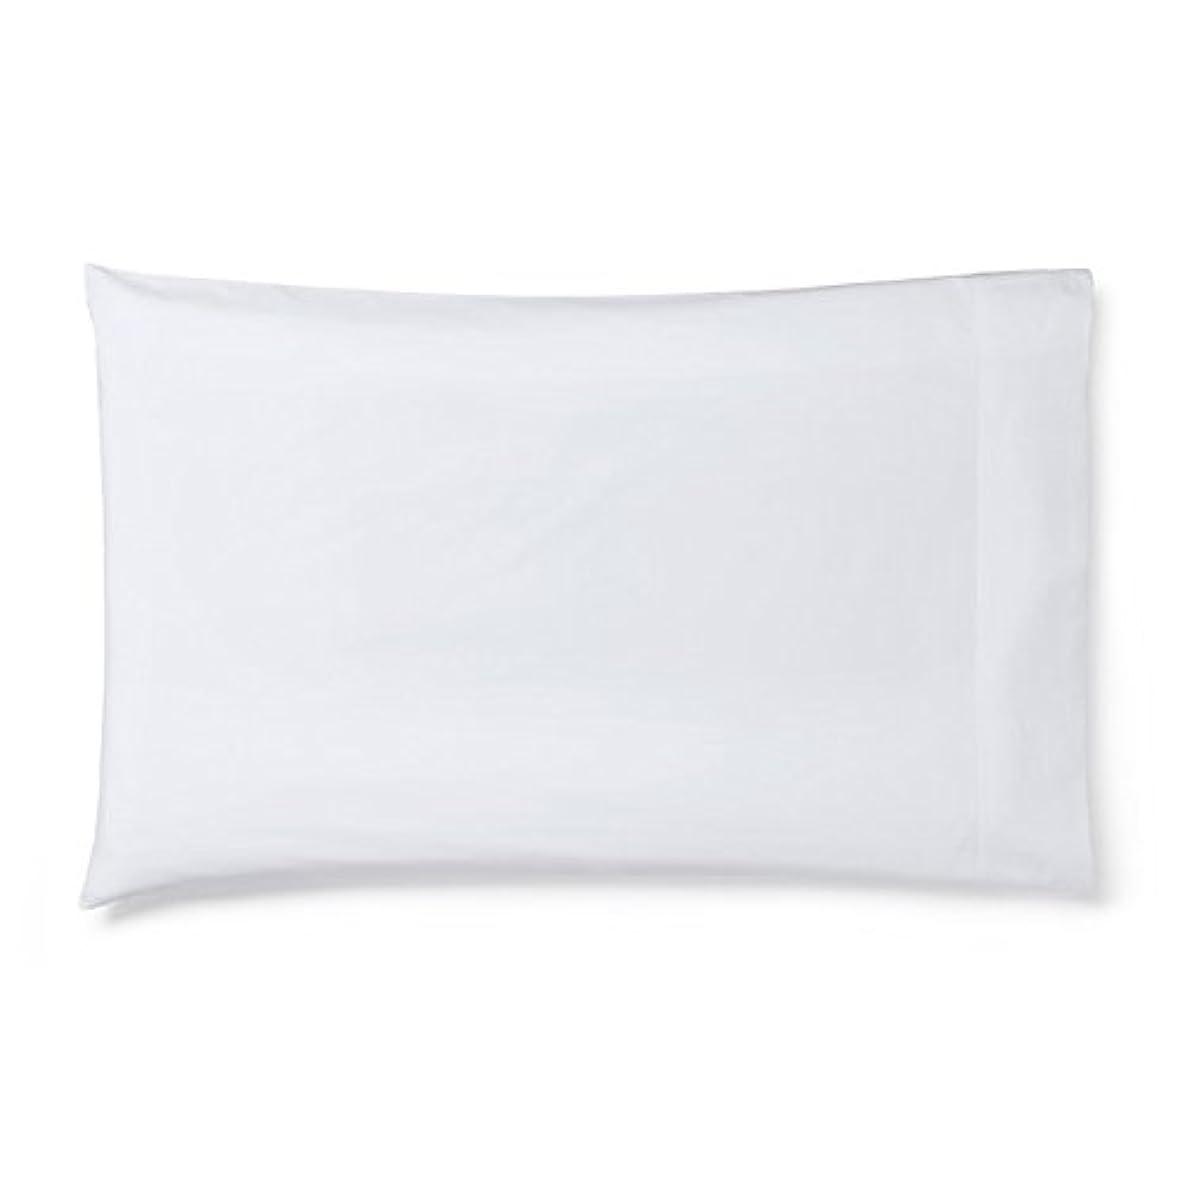 Sferra Simply Celeste Standard Pillow Cases (Pair) - White